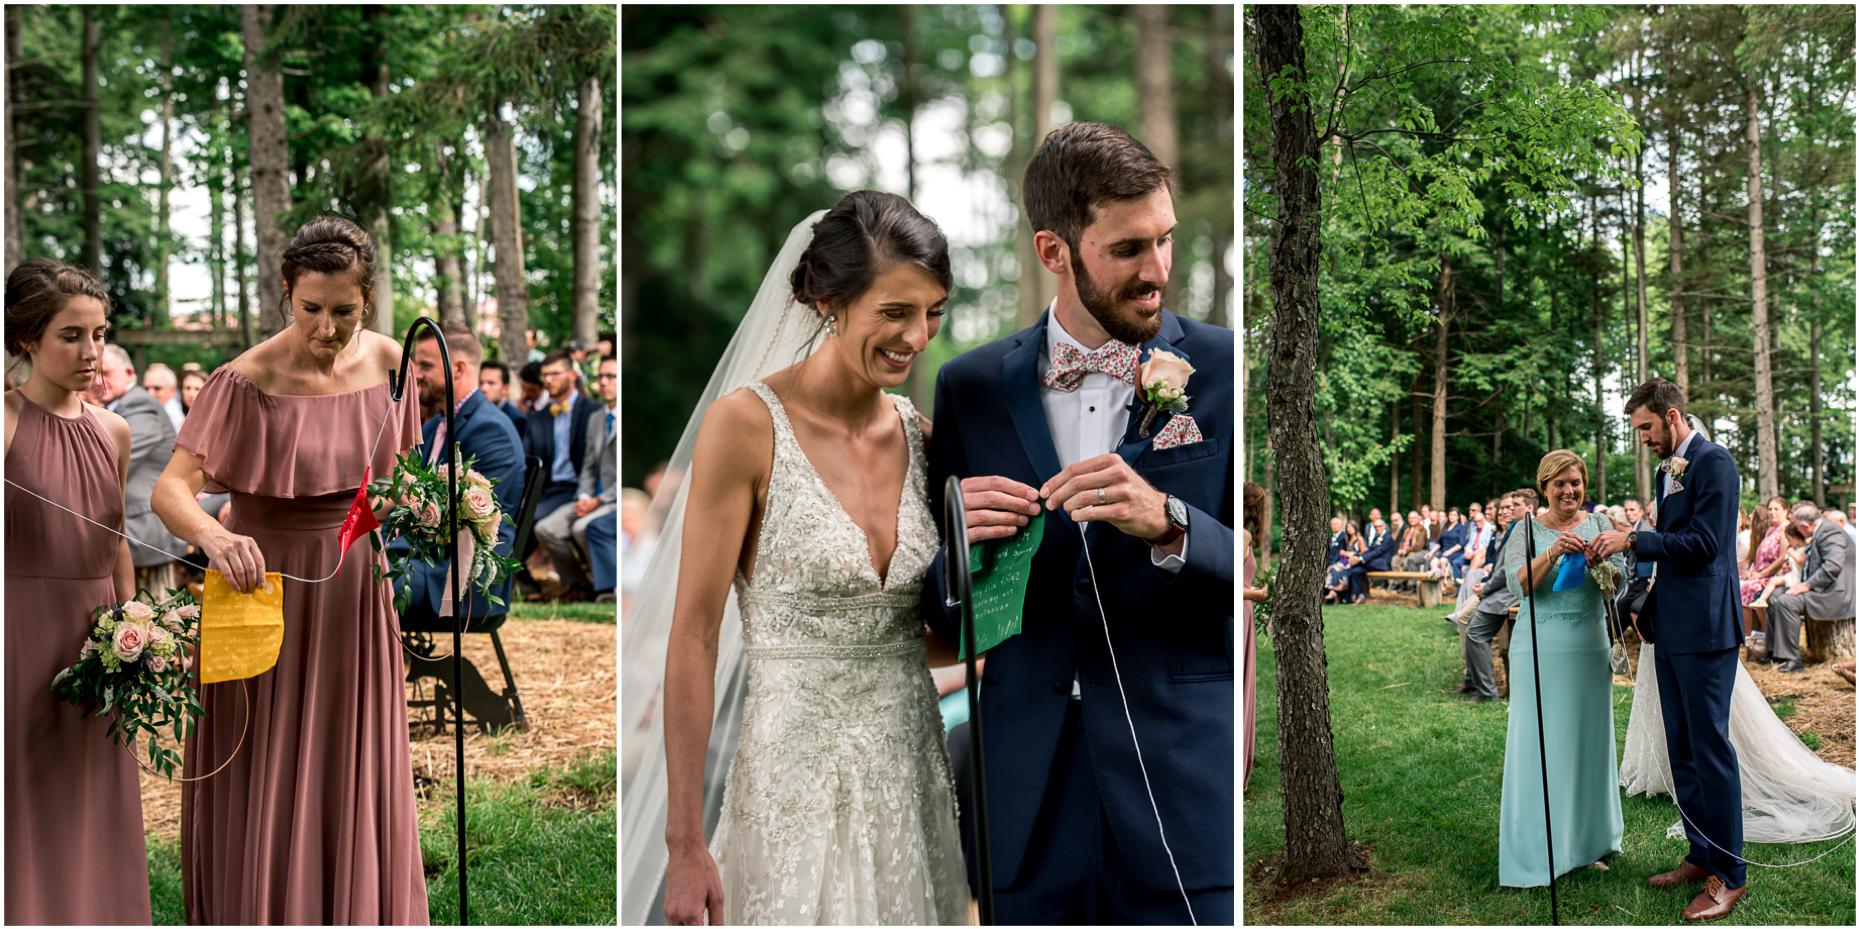 prayer flag stringing during wedding ceremony